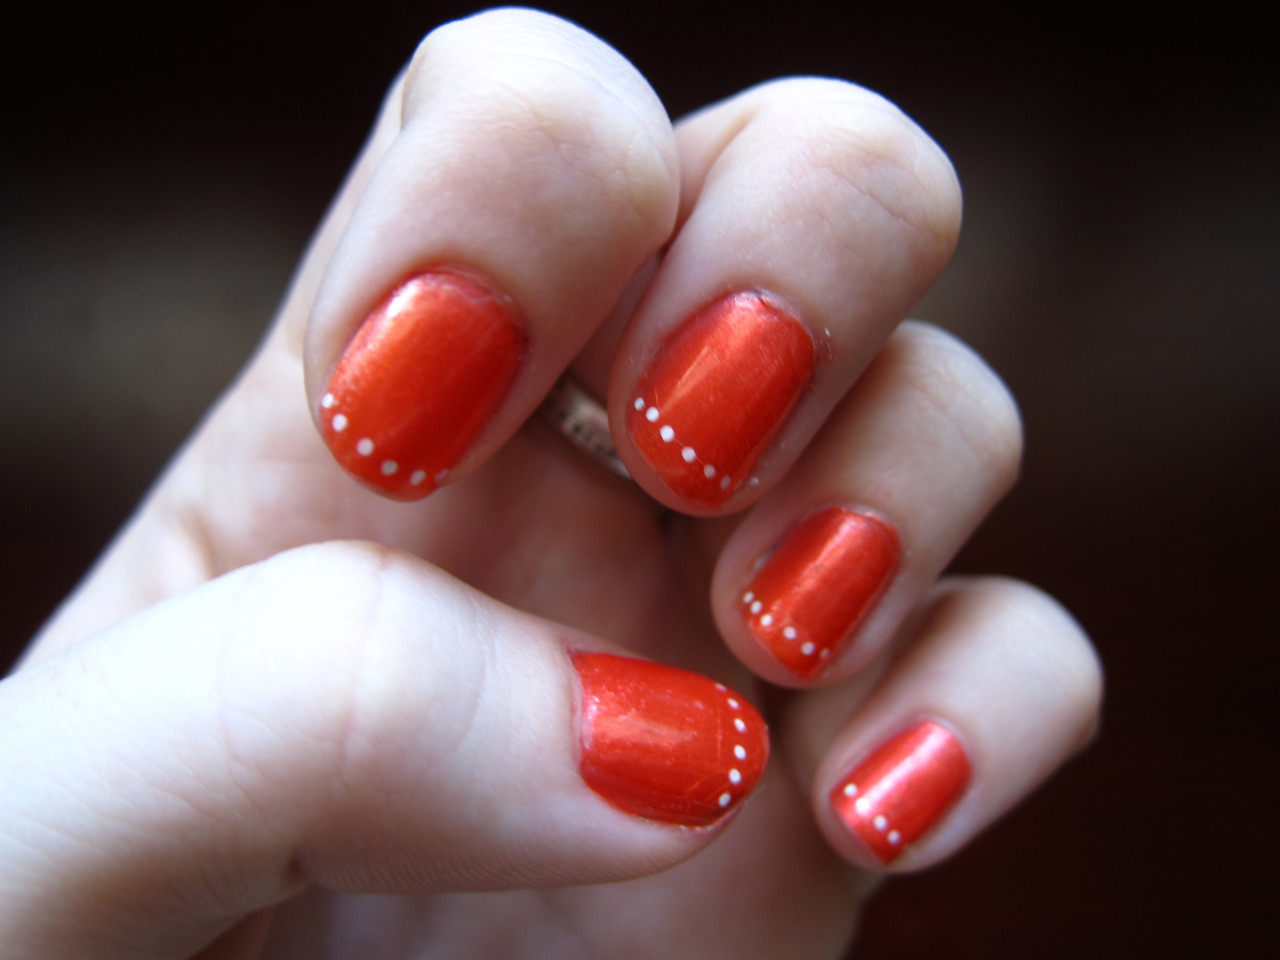 Orange Nails With White Dots Design Nail Art